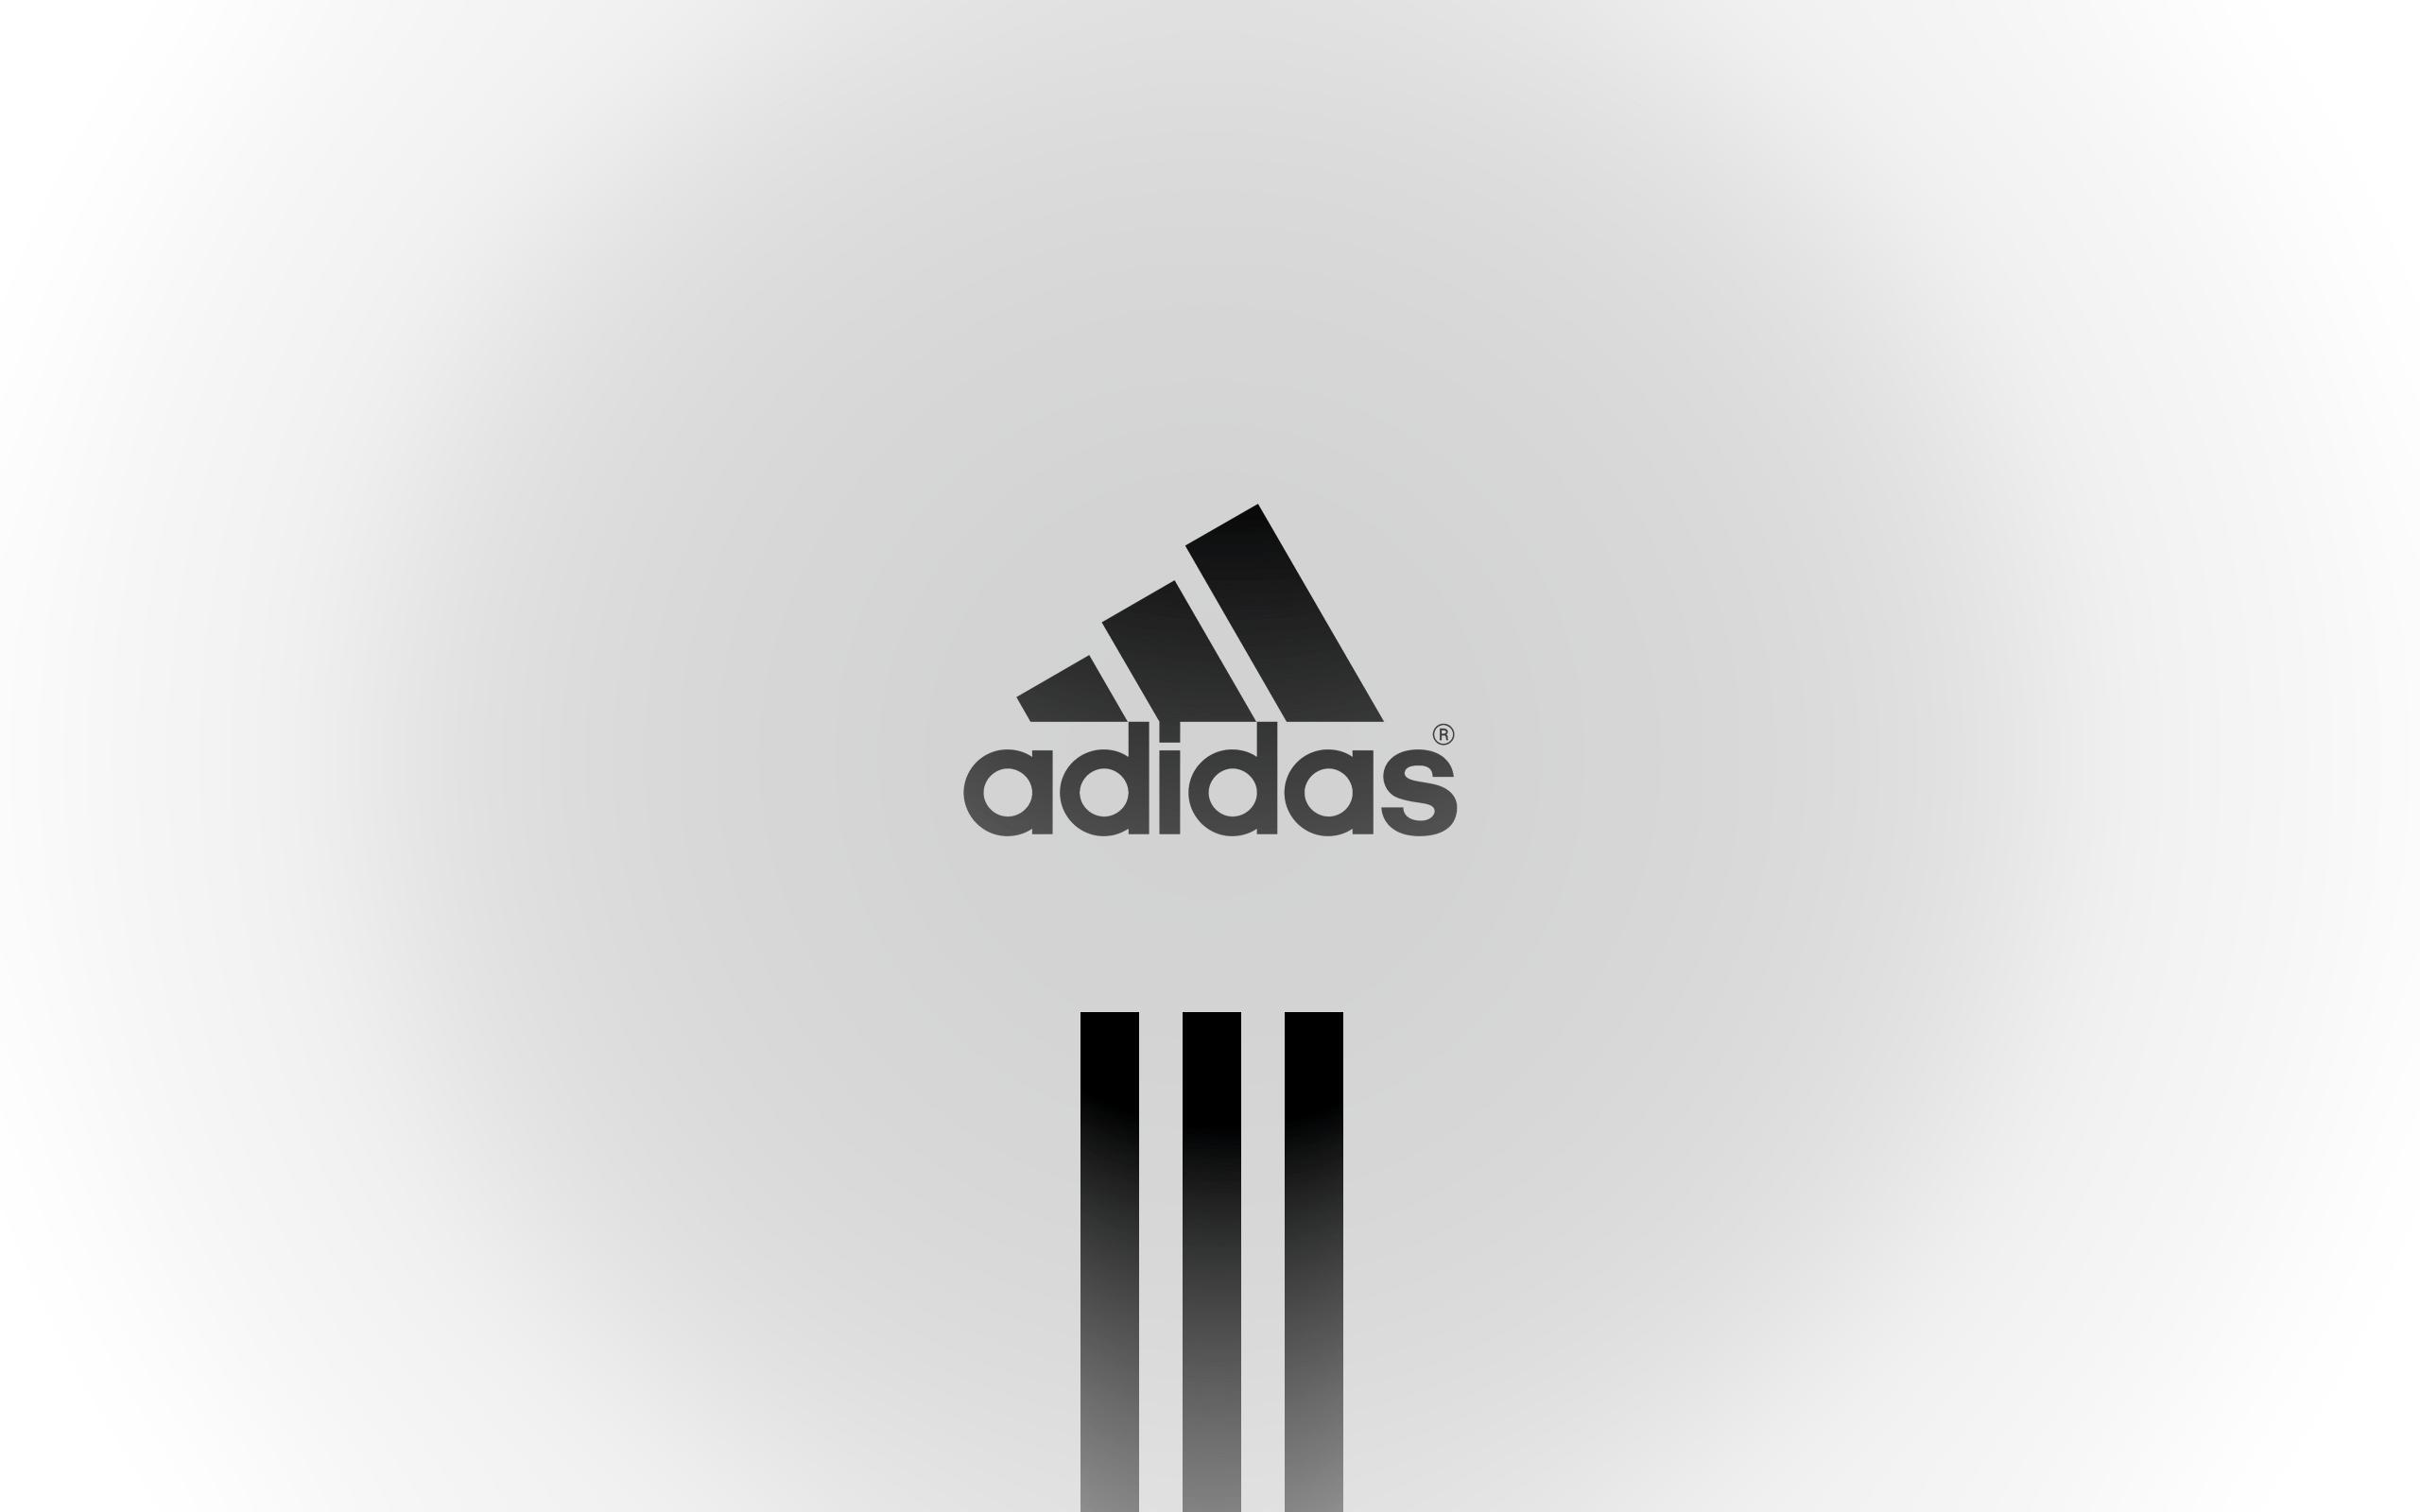 Adidas 2016 Wallpapers - Wallpaper Cave